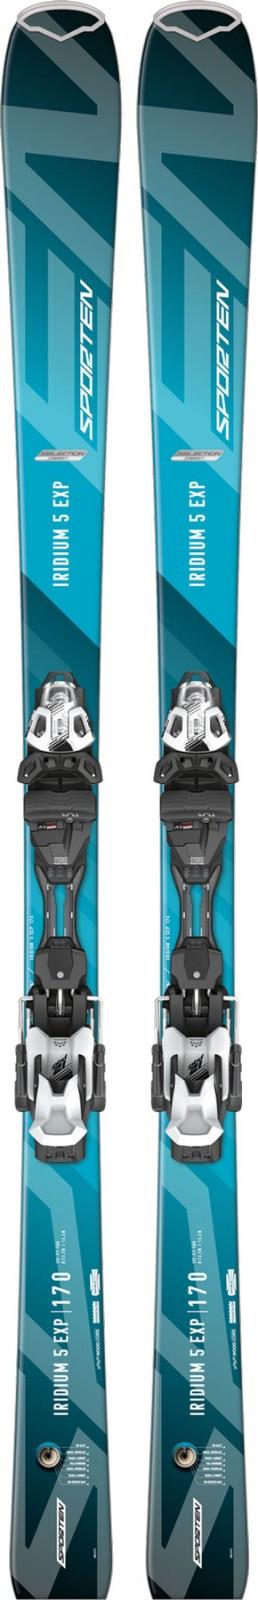 Sporten Iridium 5 EXP + PRD 12